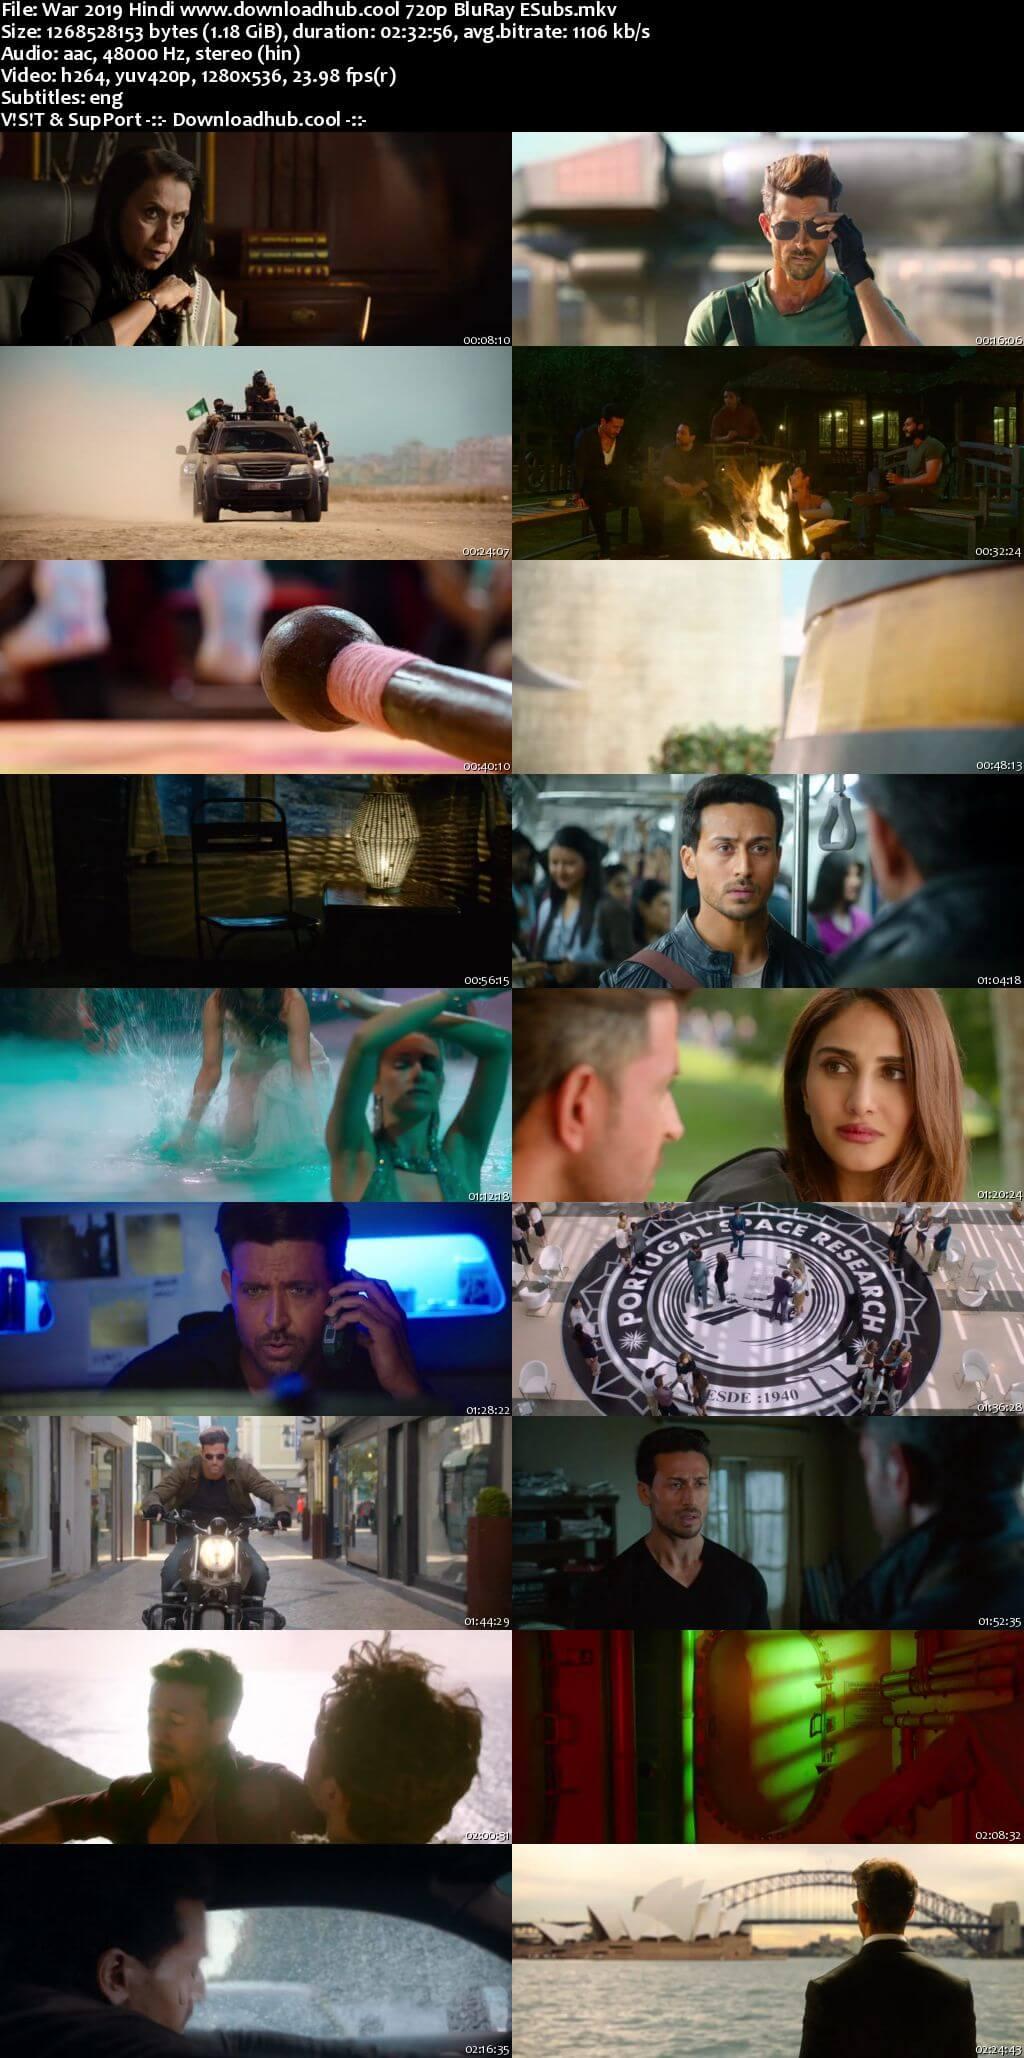 War 2019 Hindi 720p BluRay ESubs